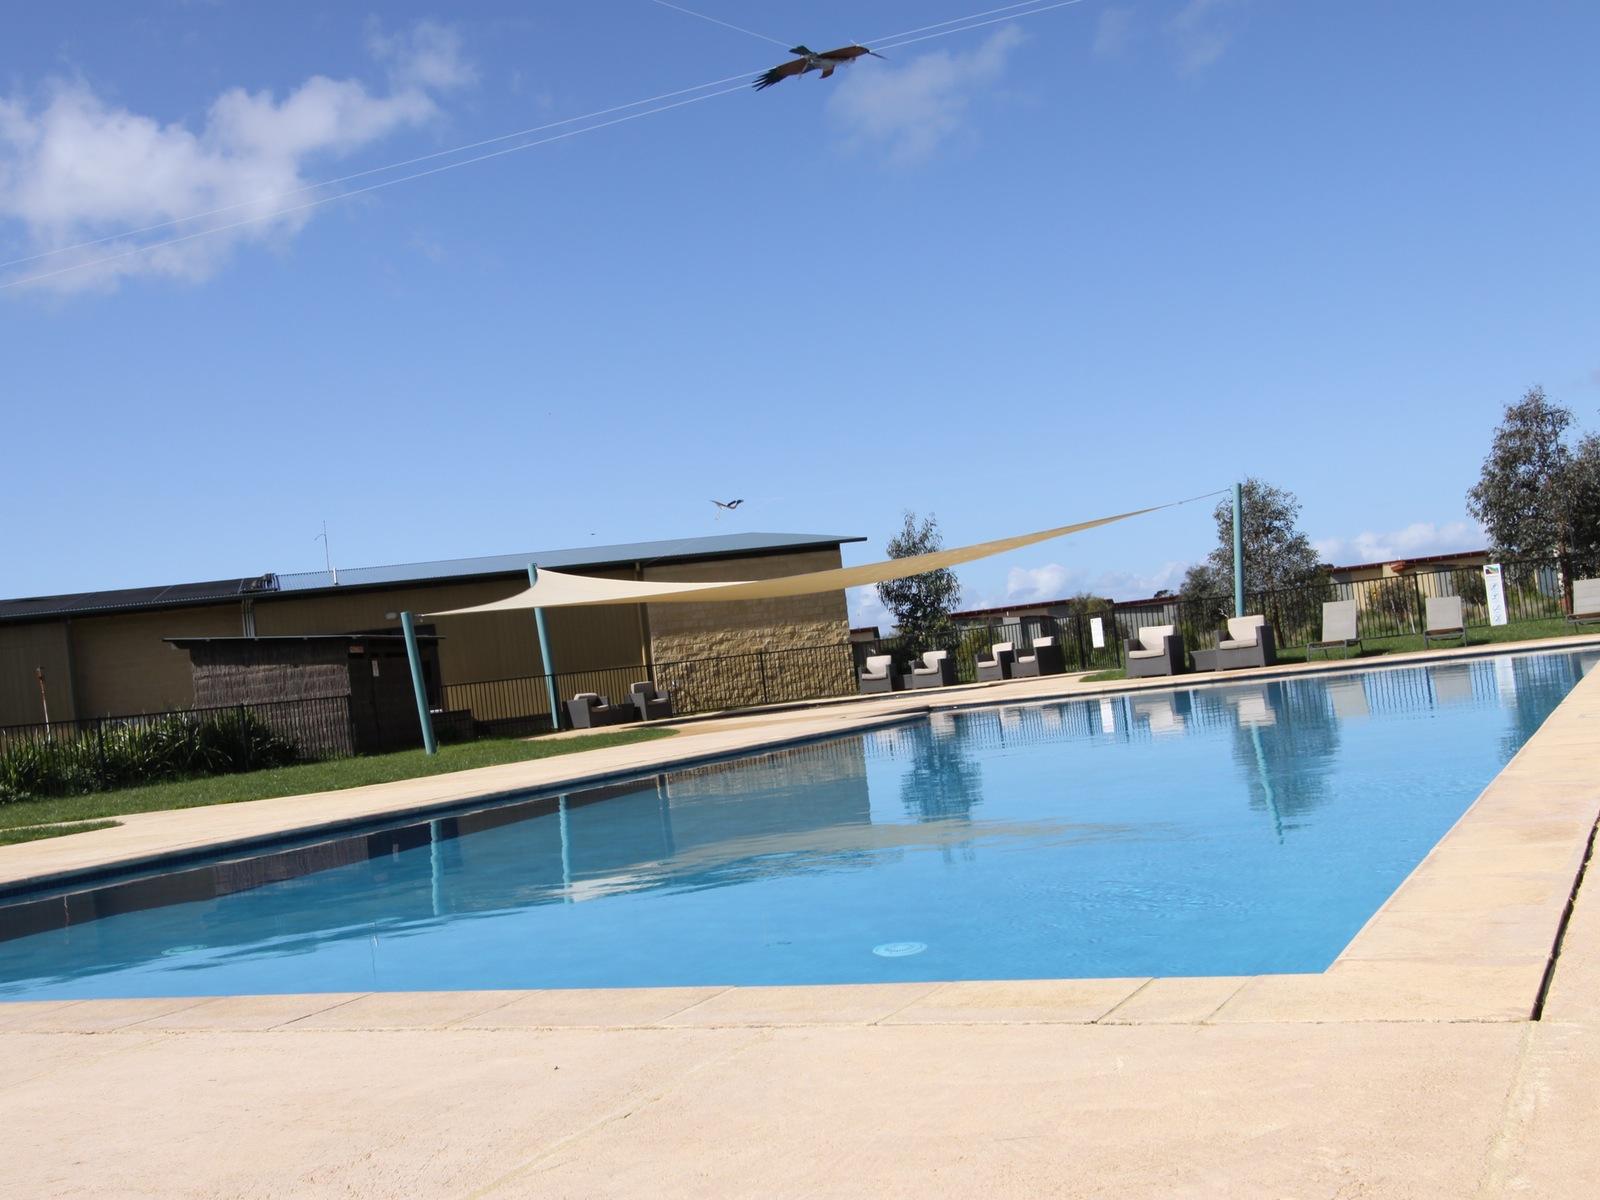 Ramada Resort Phillip Island swimming pool